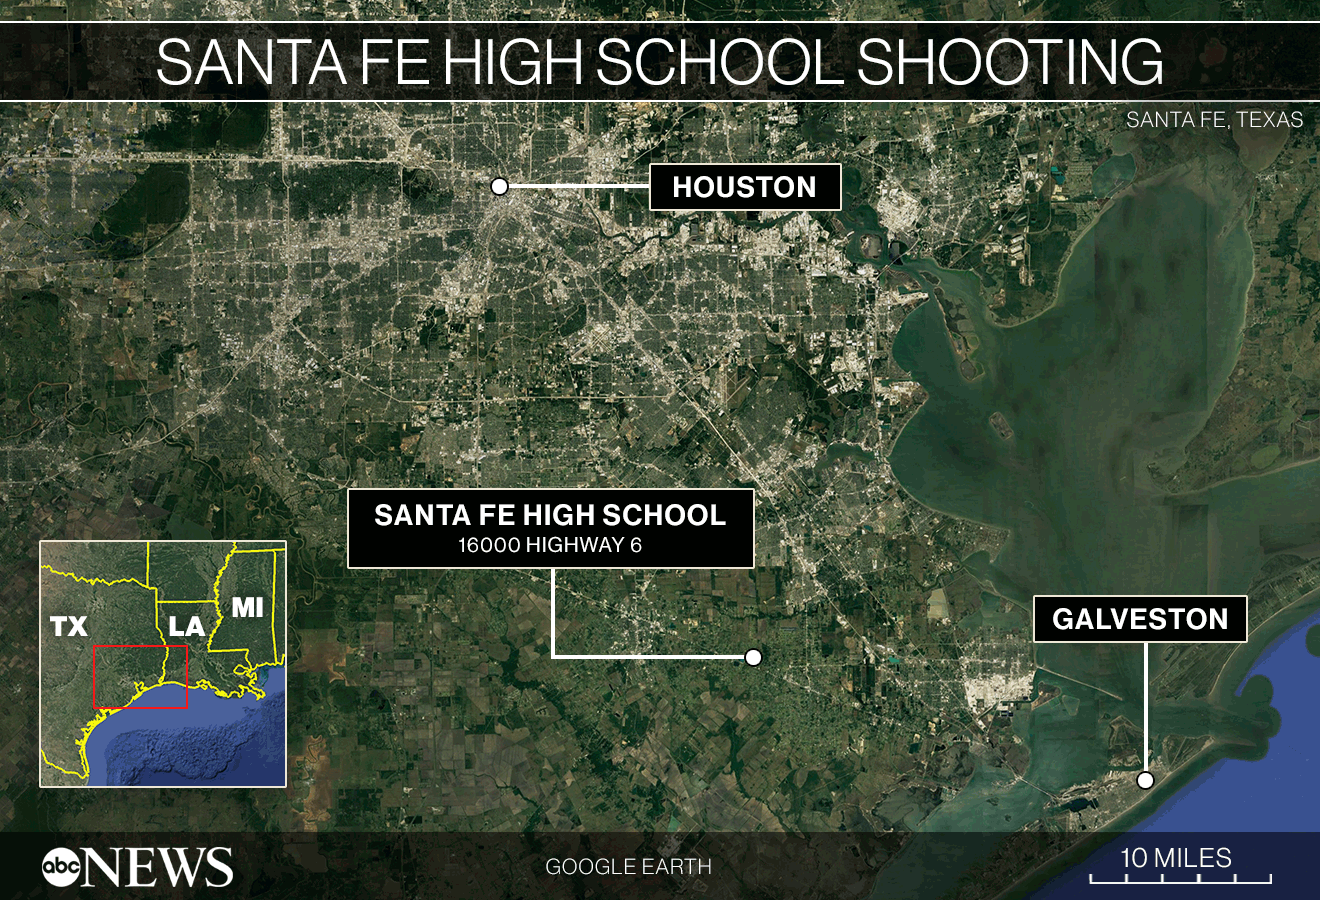 Santa Fe News >> 10 Dead 10 Wounded In Shooting At Santa Fe High School In Texas